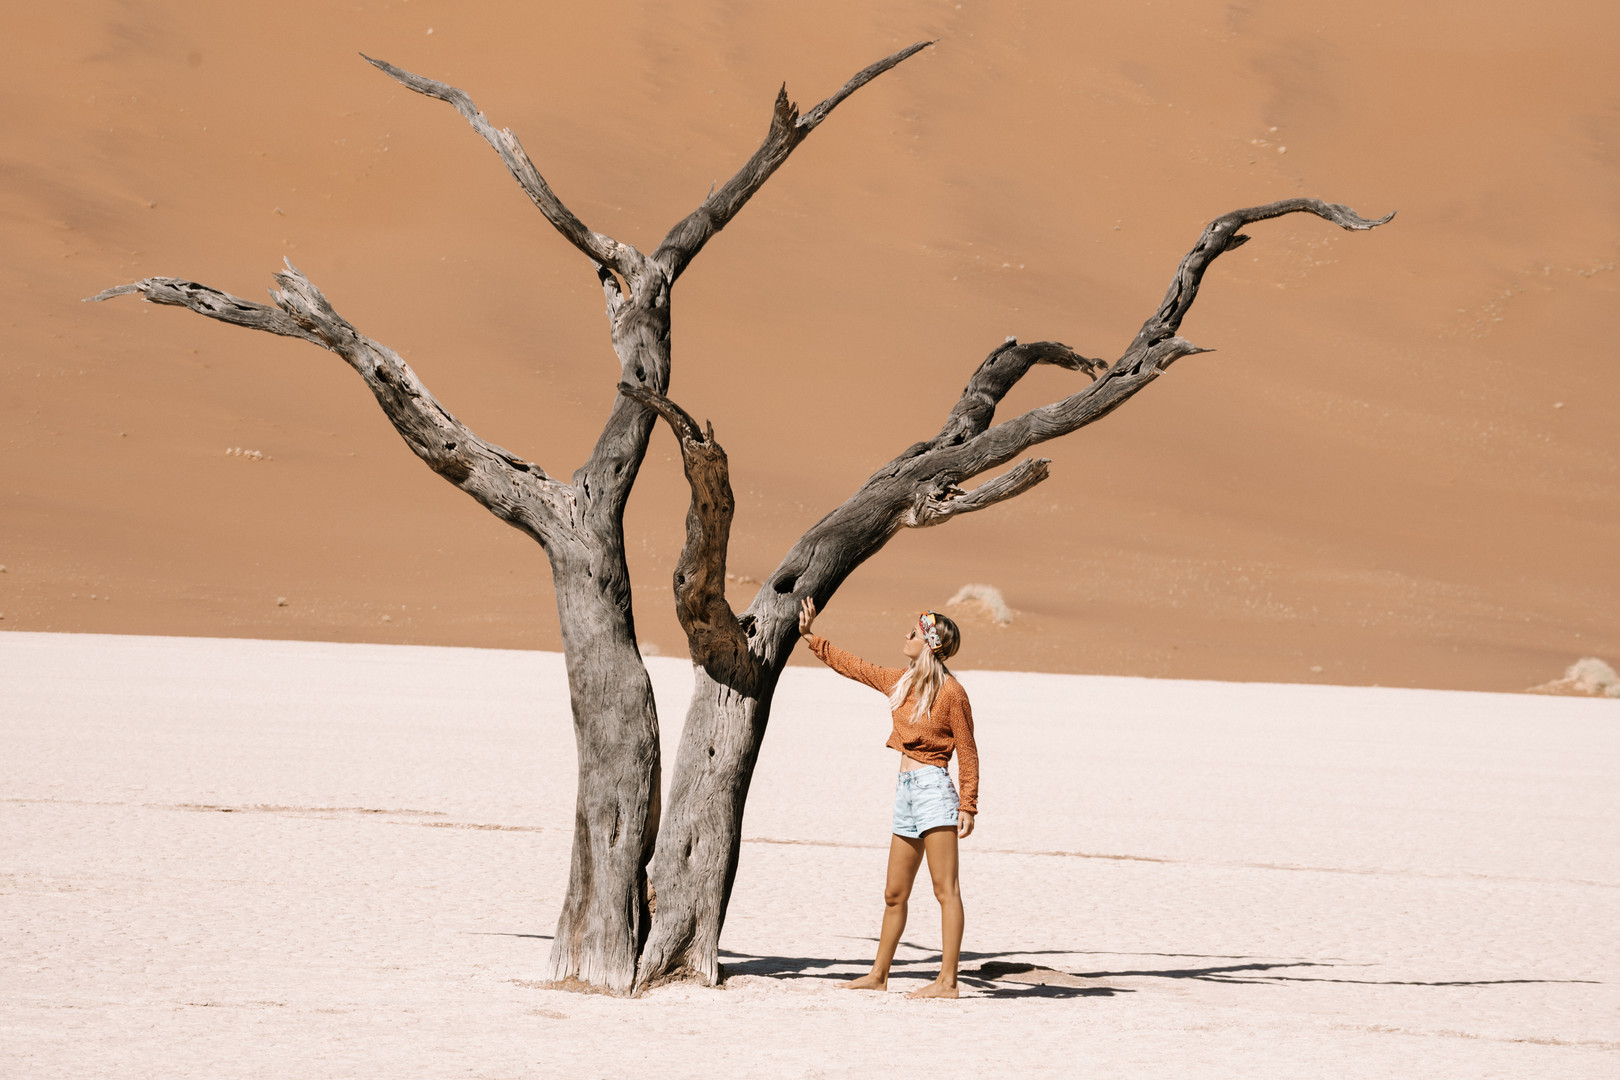 Namibia Kitesurf trip